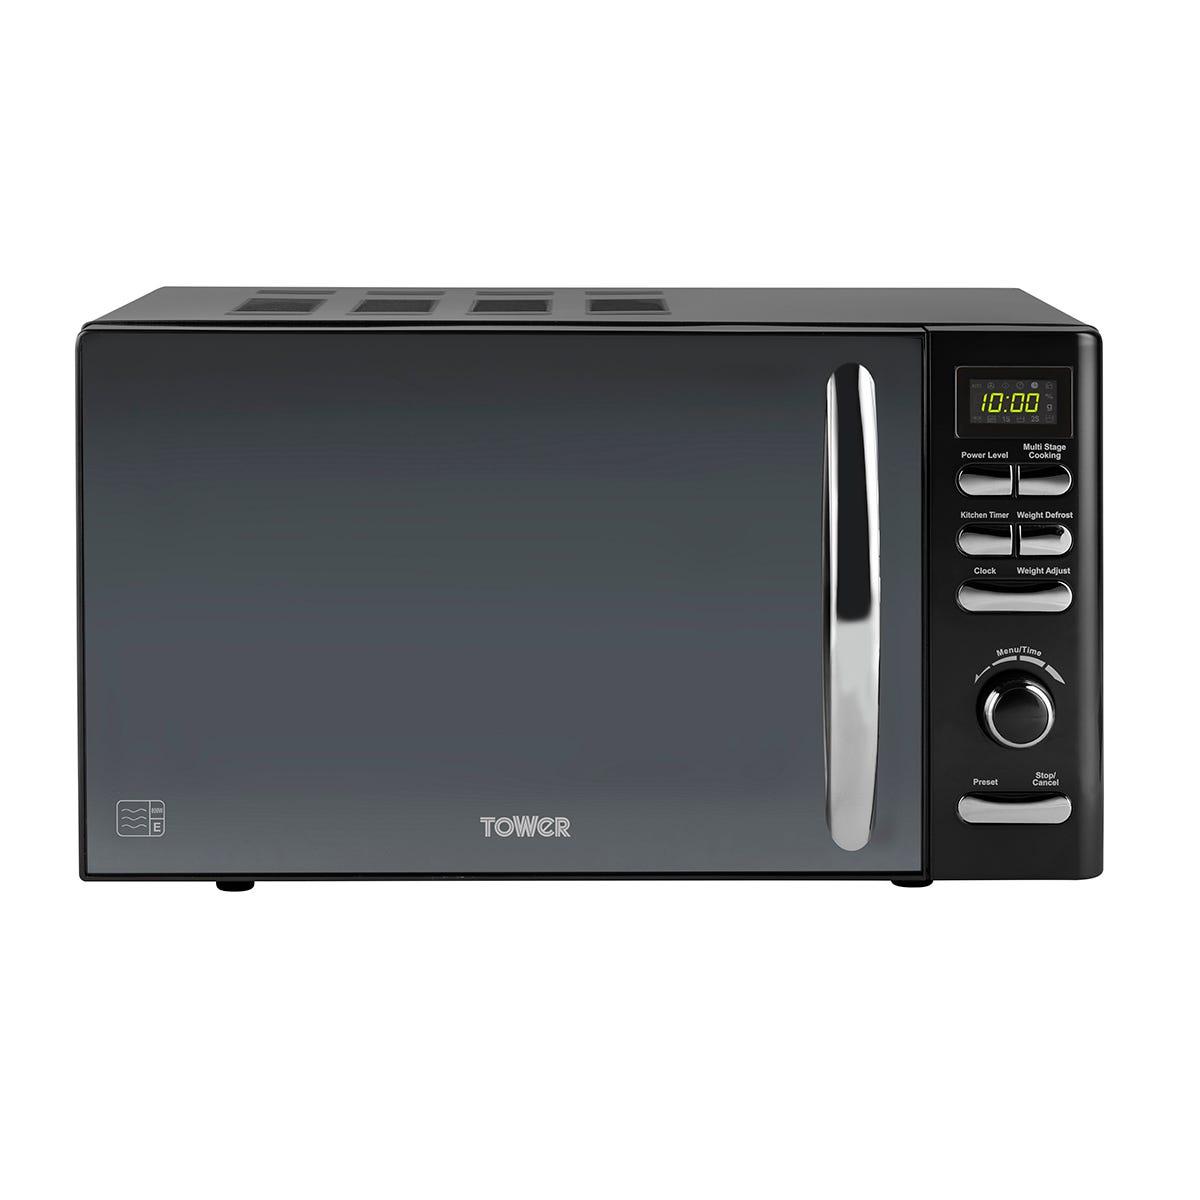 Tower T24019 Infinity 800W 20L Digital Microwave - Black